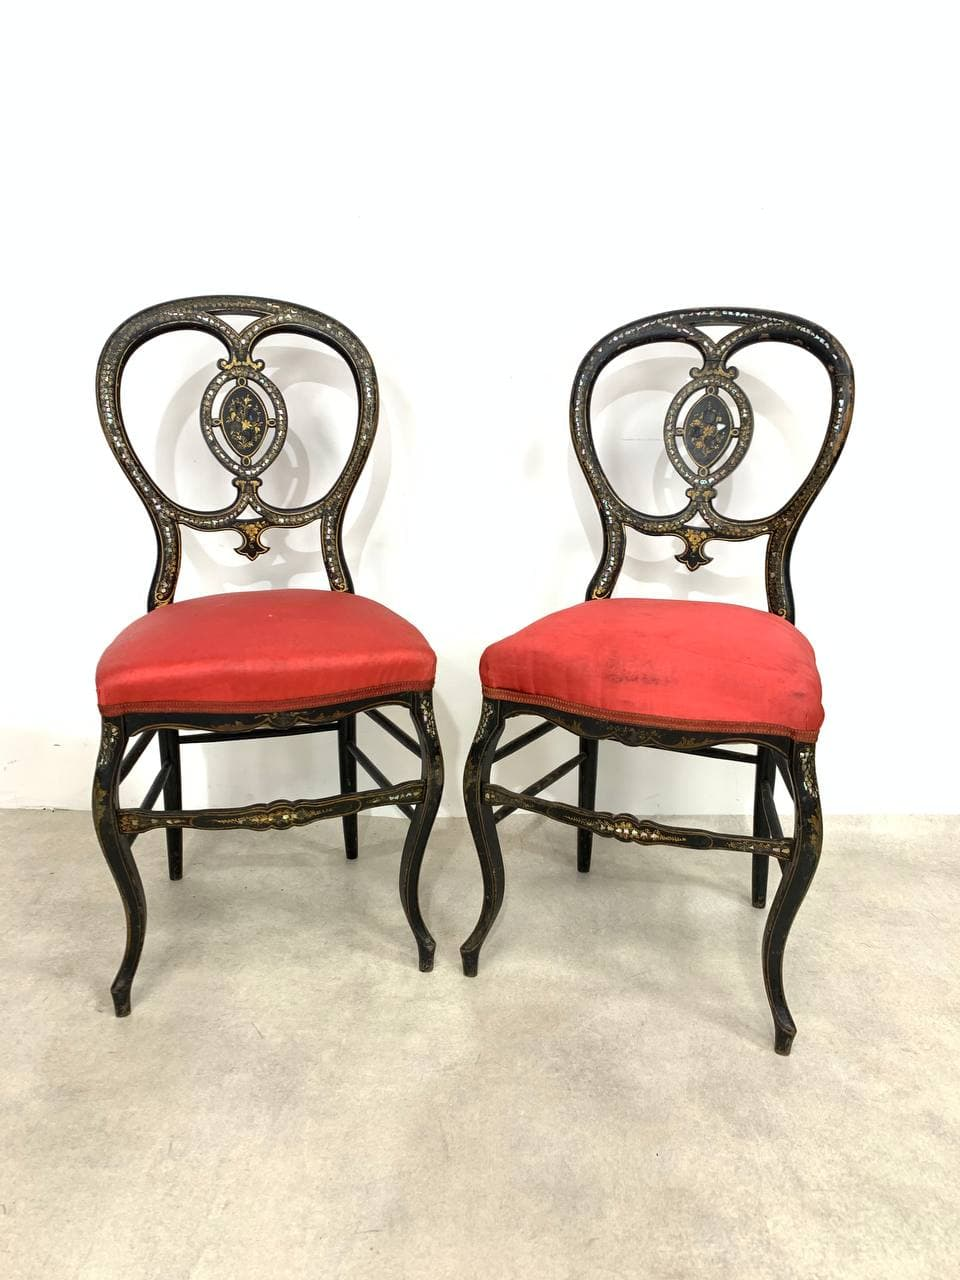 Антикварная пара стульев эпохи Наполеона ІІІ